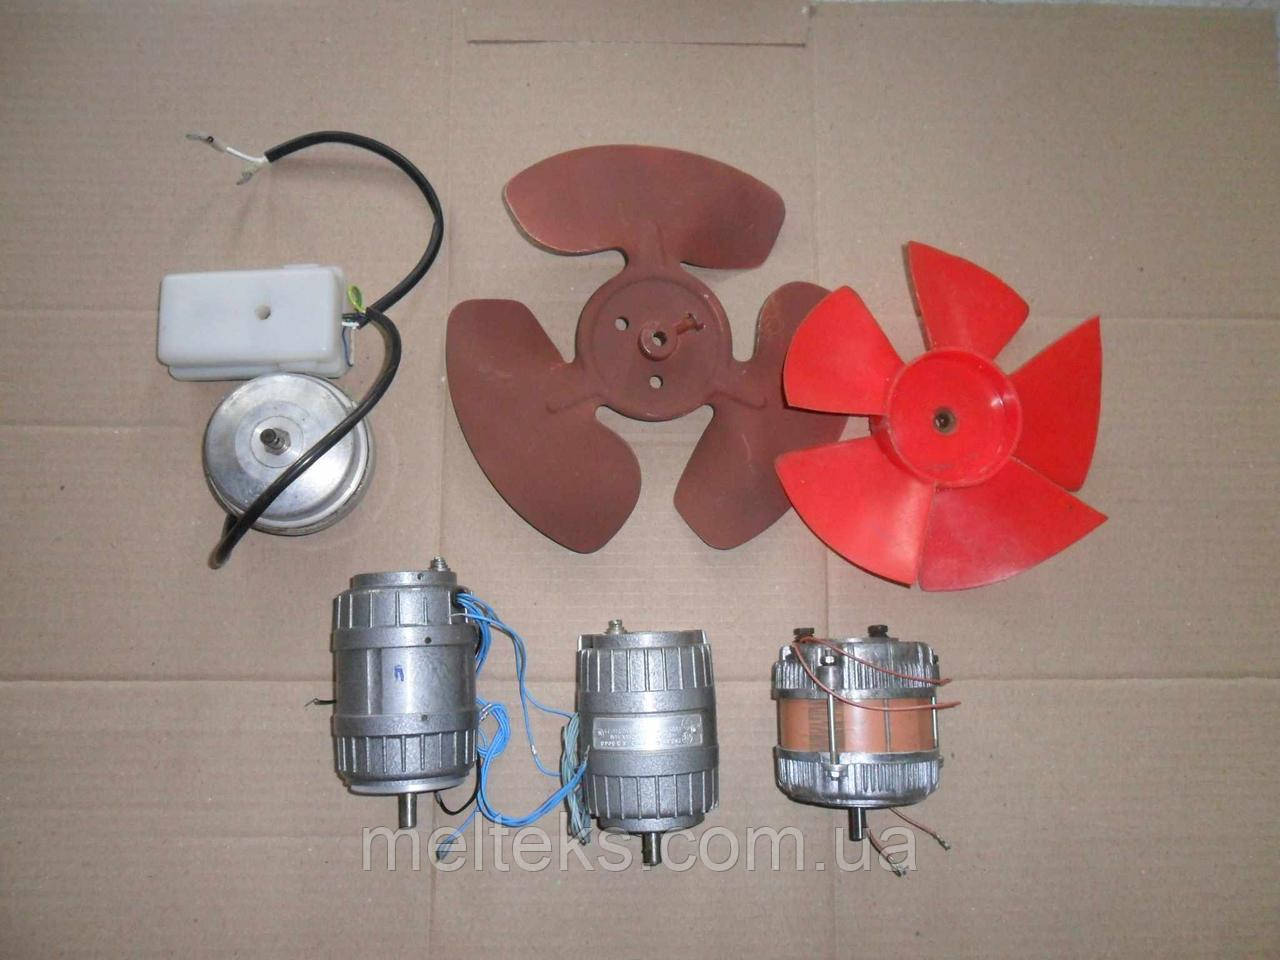 Двигатели ДАТ-75-25, АВ-042, ДАТ-75-16, ДАТ-75-40, ДАО 86, КДВ